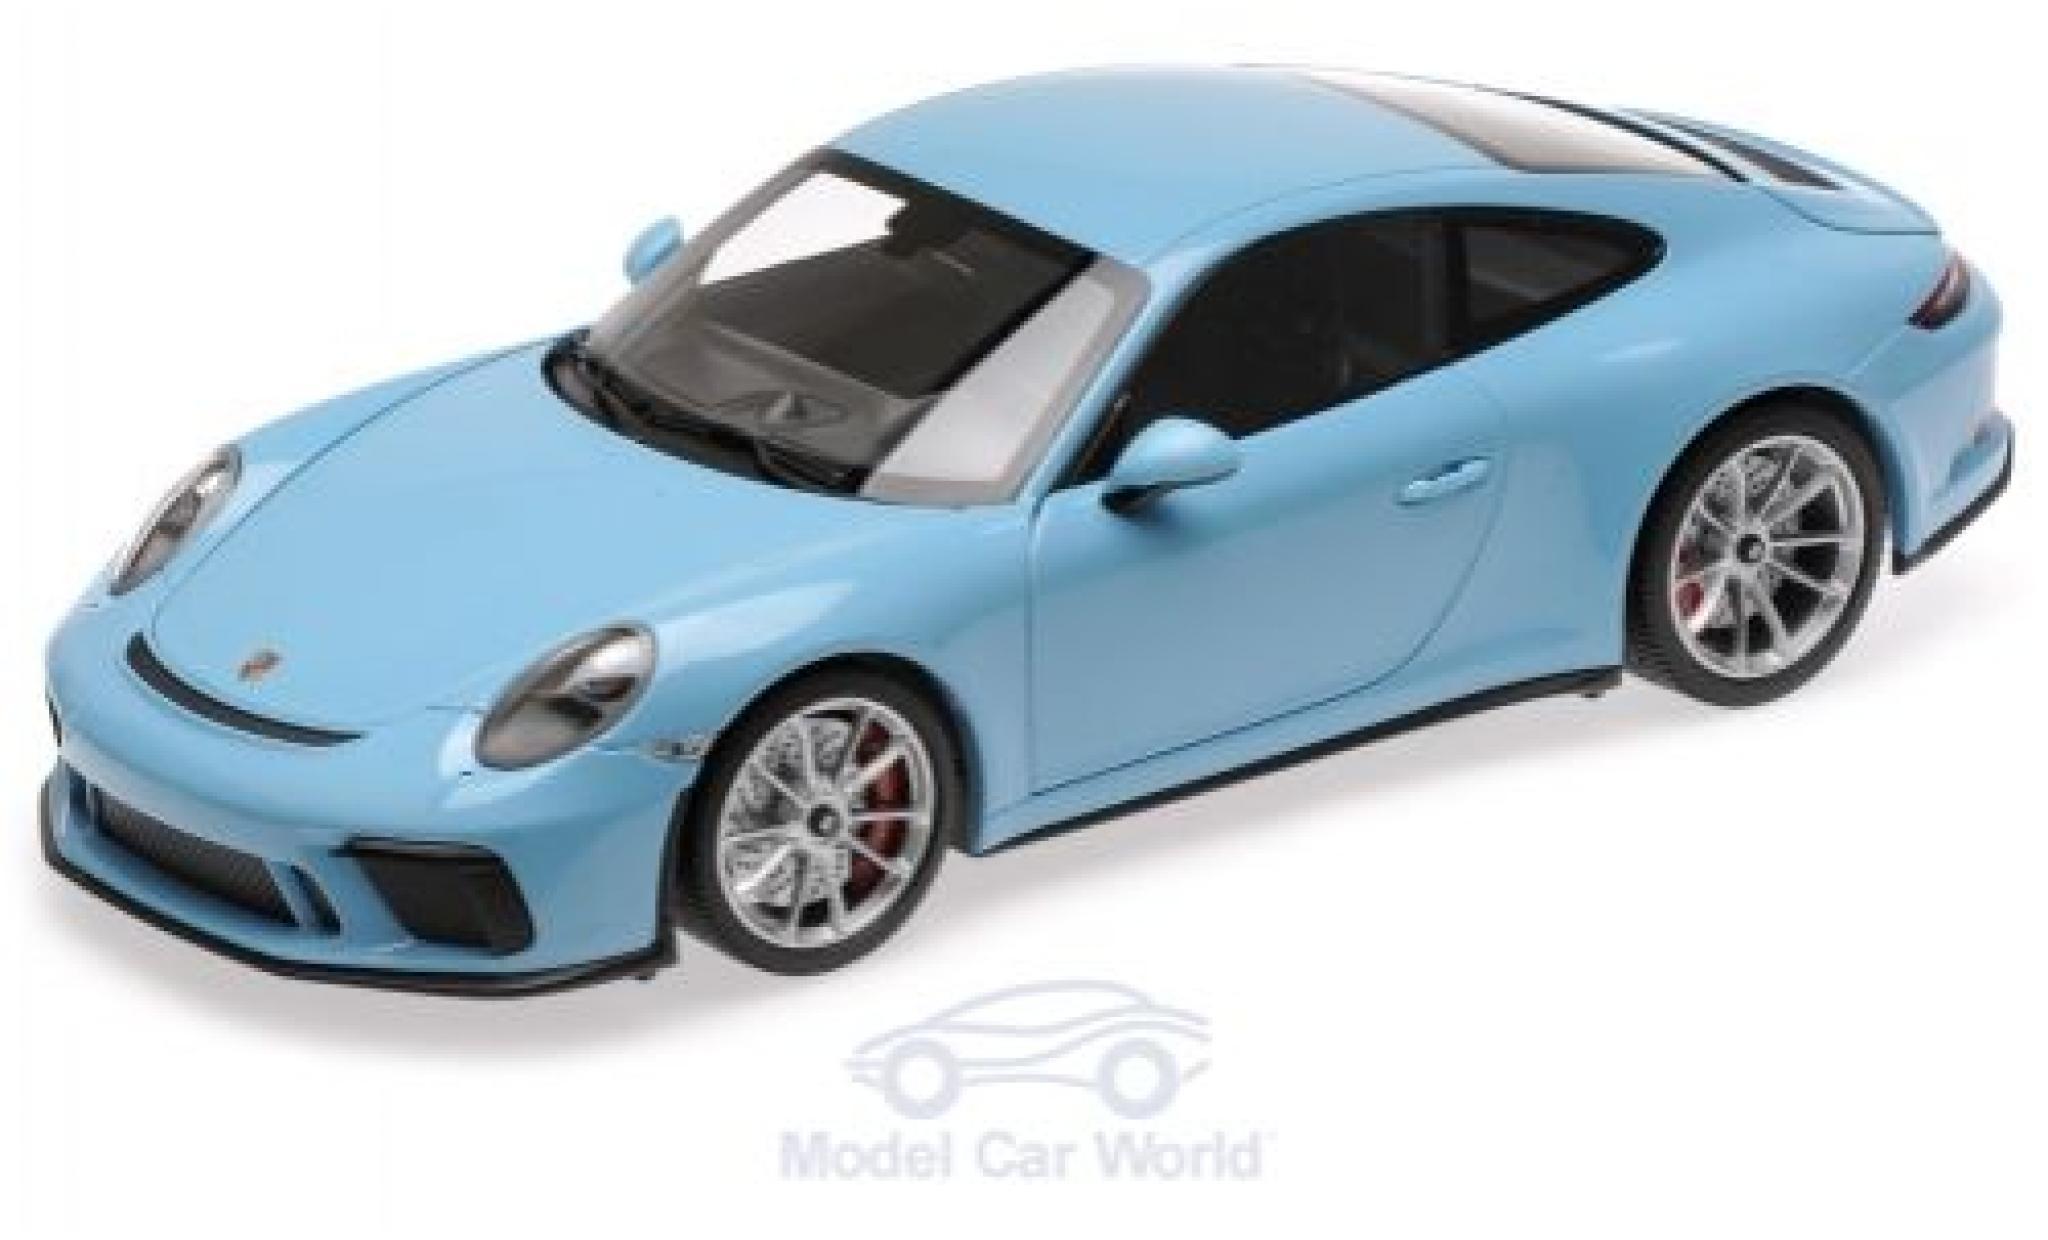 Porsche 991 GT3 1/18 Minichamps 911 Touring blue 2018